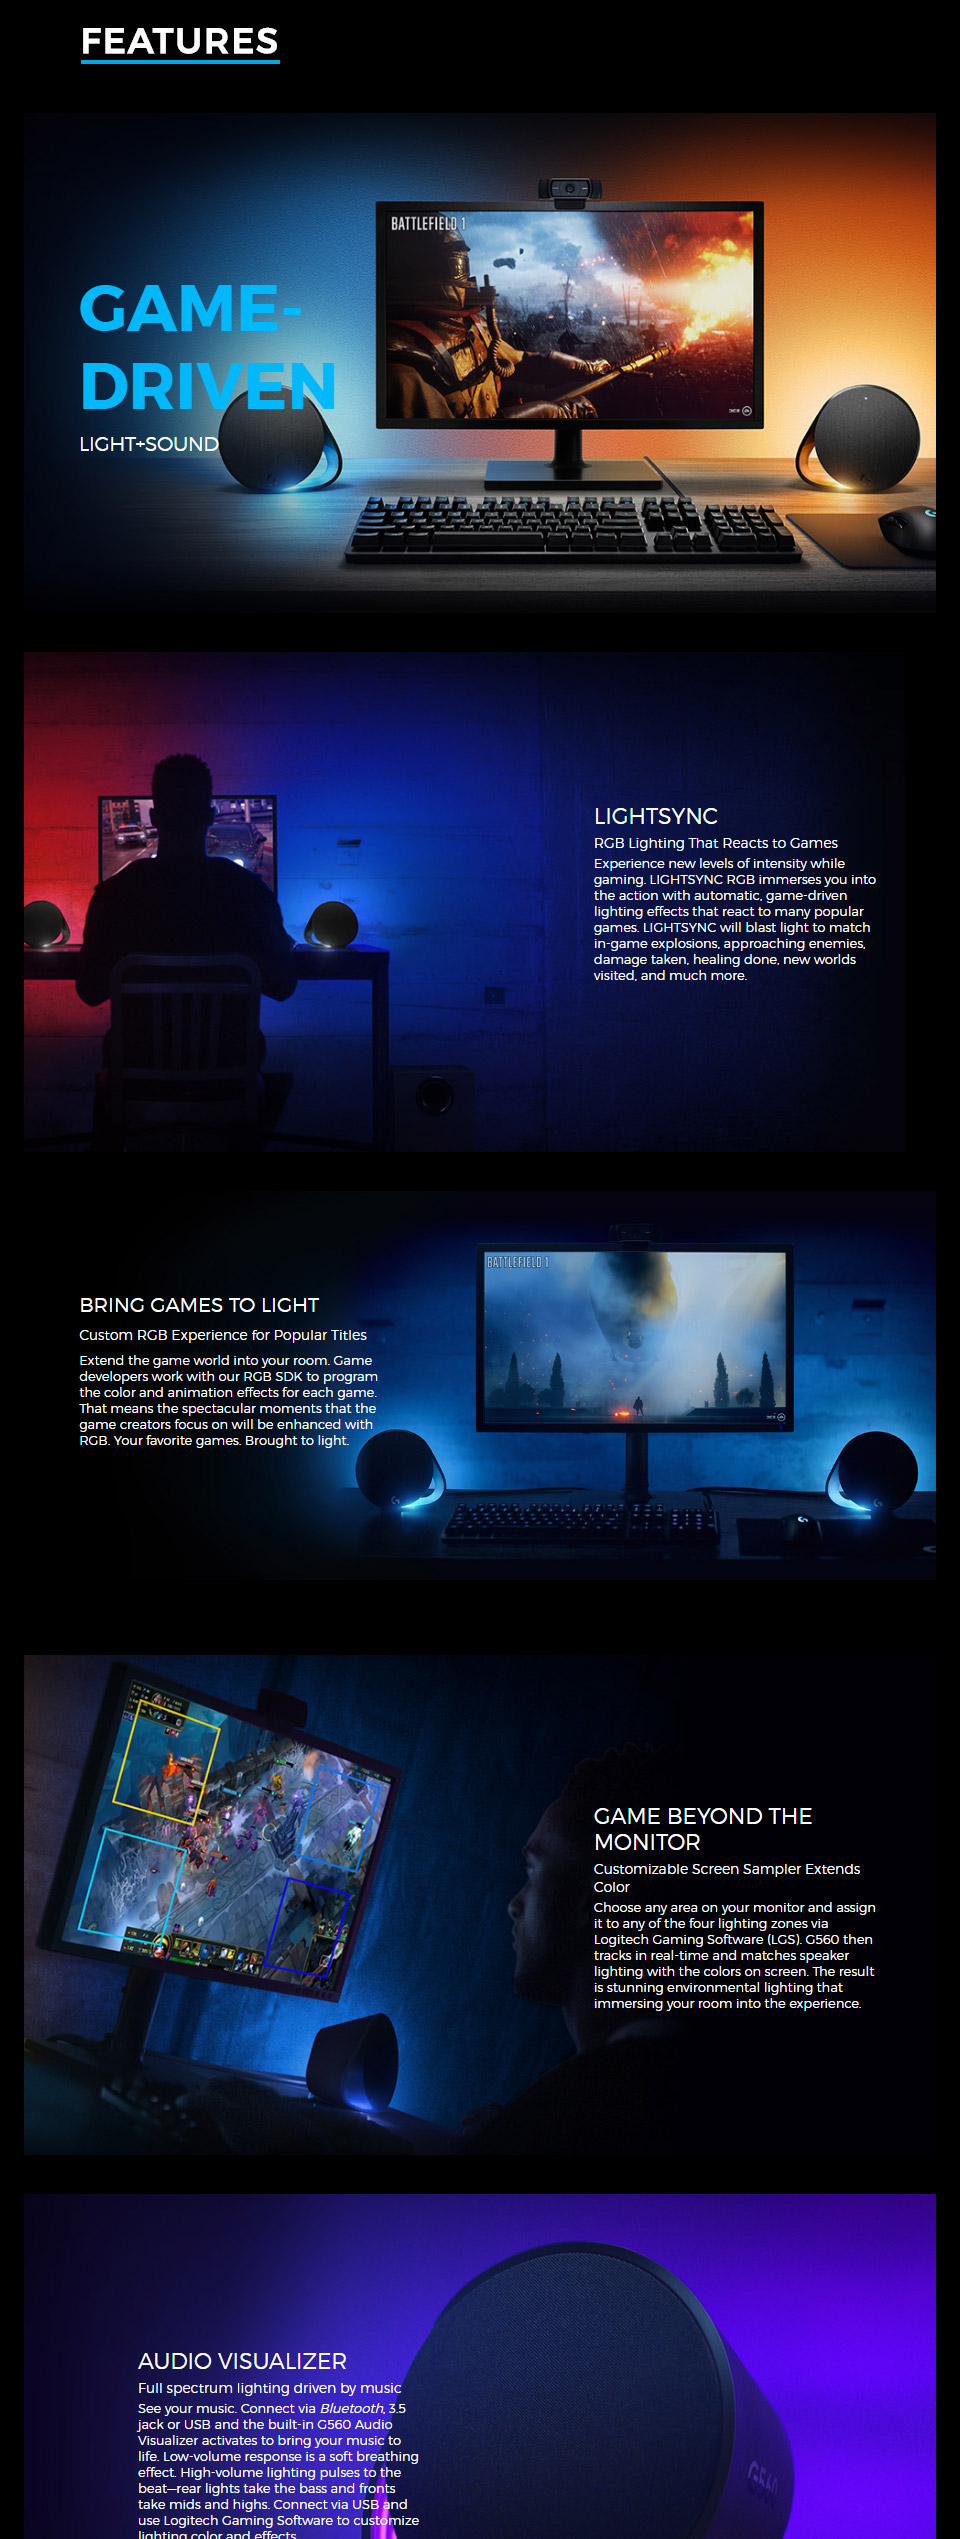 Logitech G560 Lightsync RGB 2 1 Bluetooth Gaming Speakers